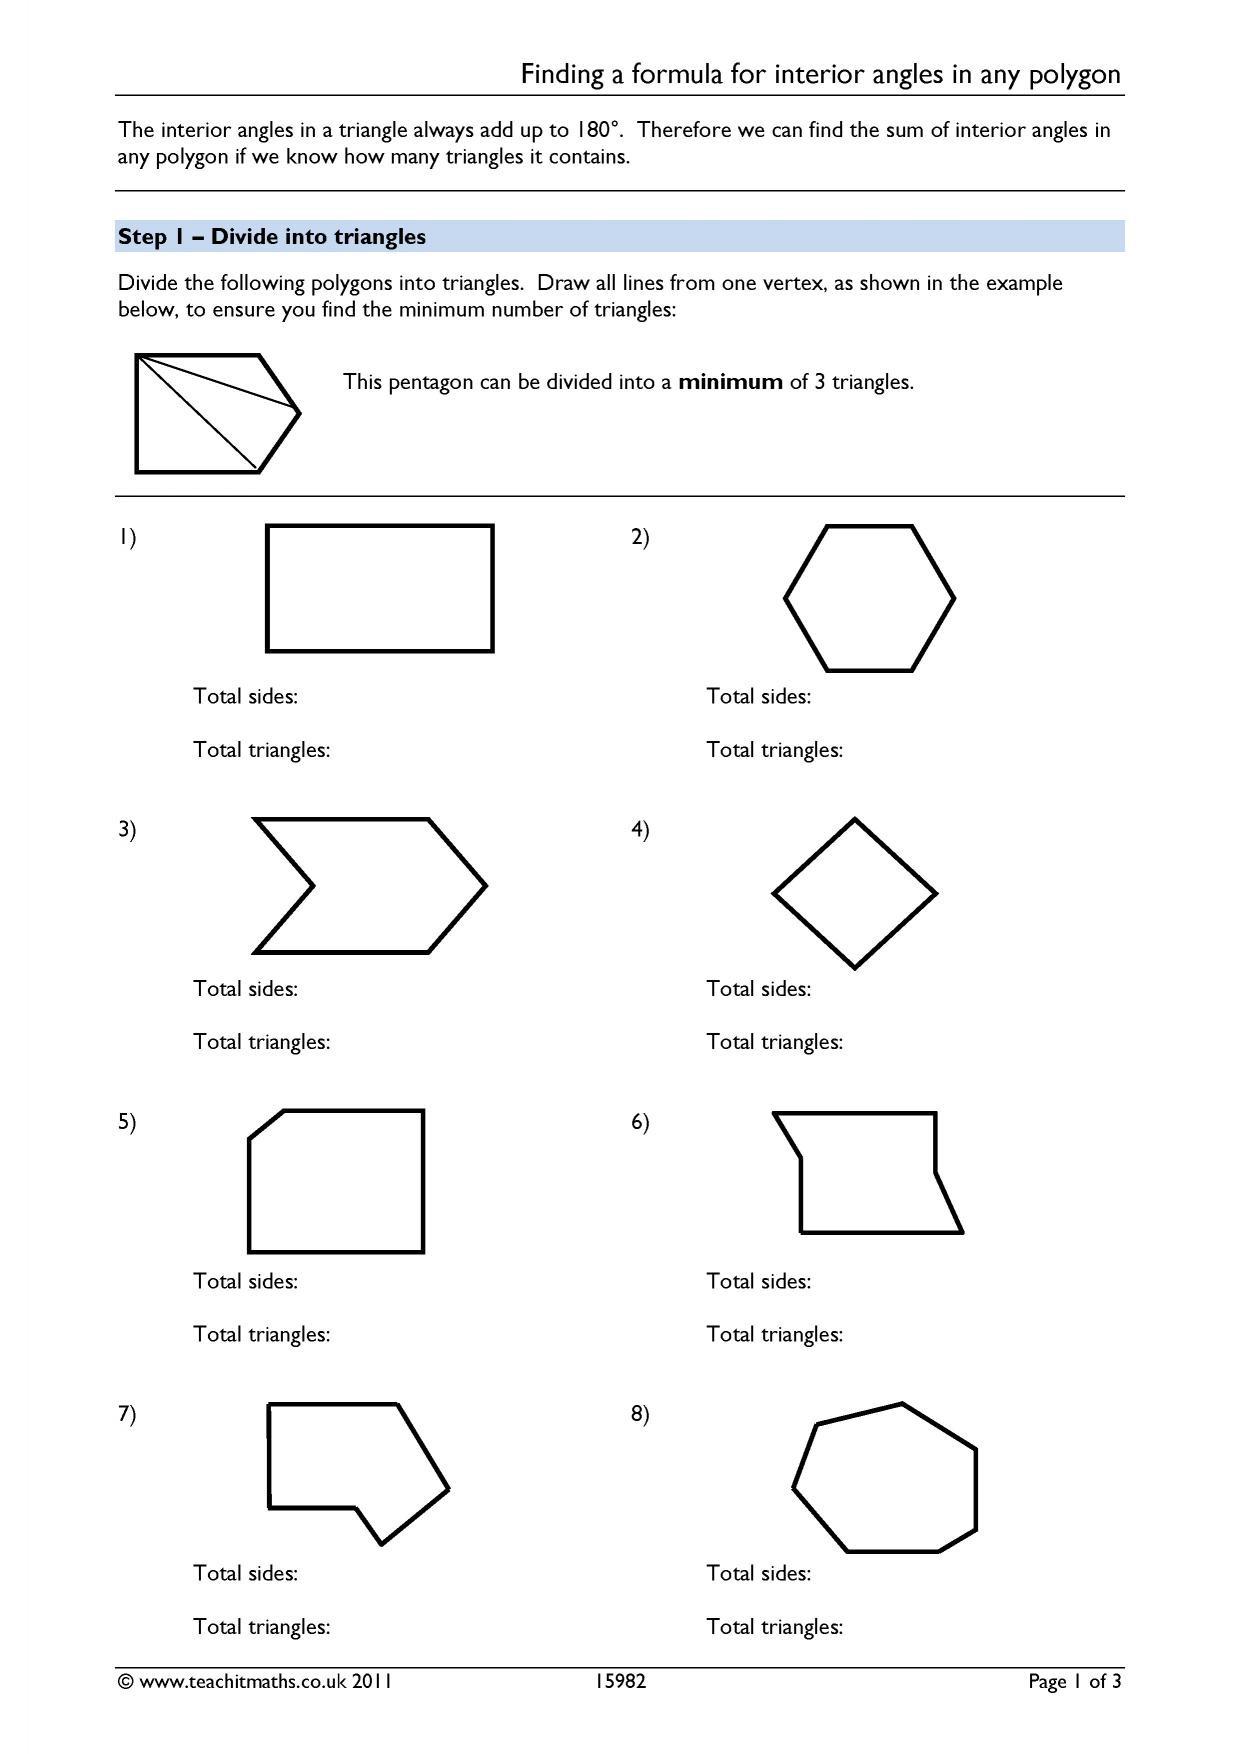 30 Triangle Angle Sum Worksheet